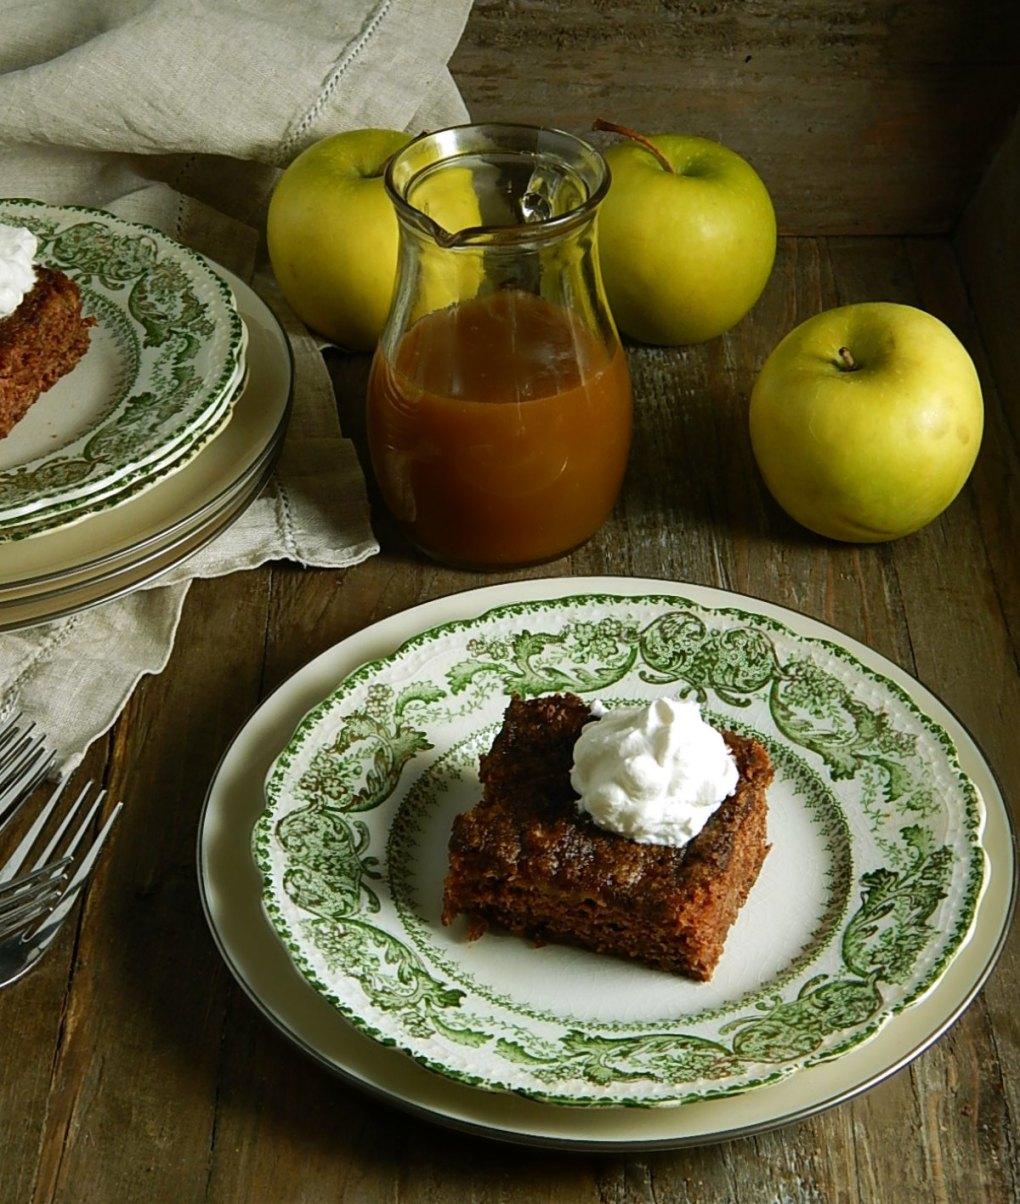 Grandma's Apple Cake with Caramel Rum Sauce